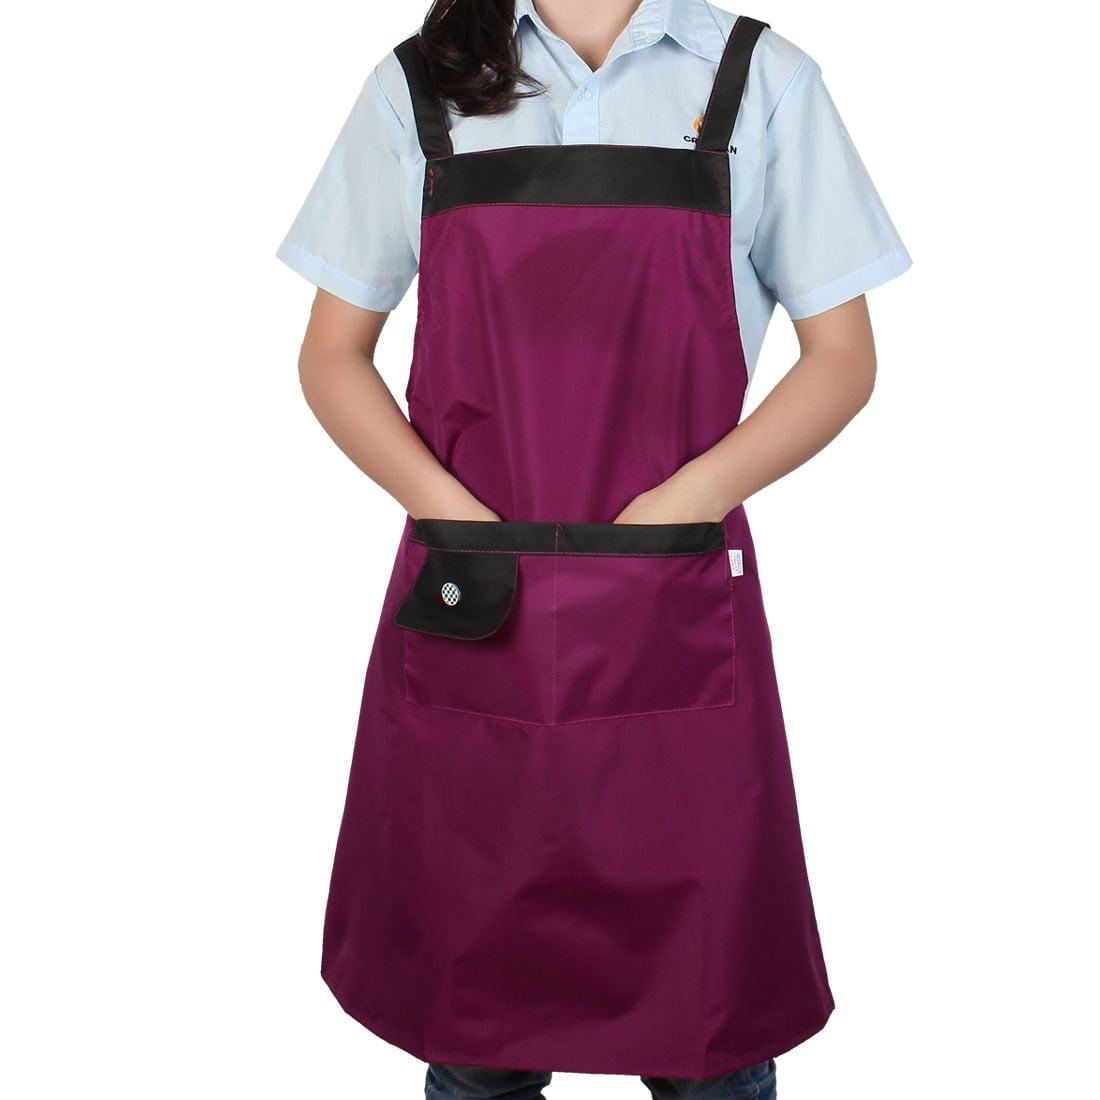 Household Restaurant Kitchen Waterproof Fuchsia Cooking Apron Bib Dress w Pocket